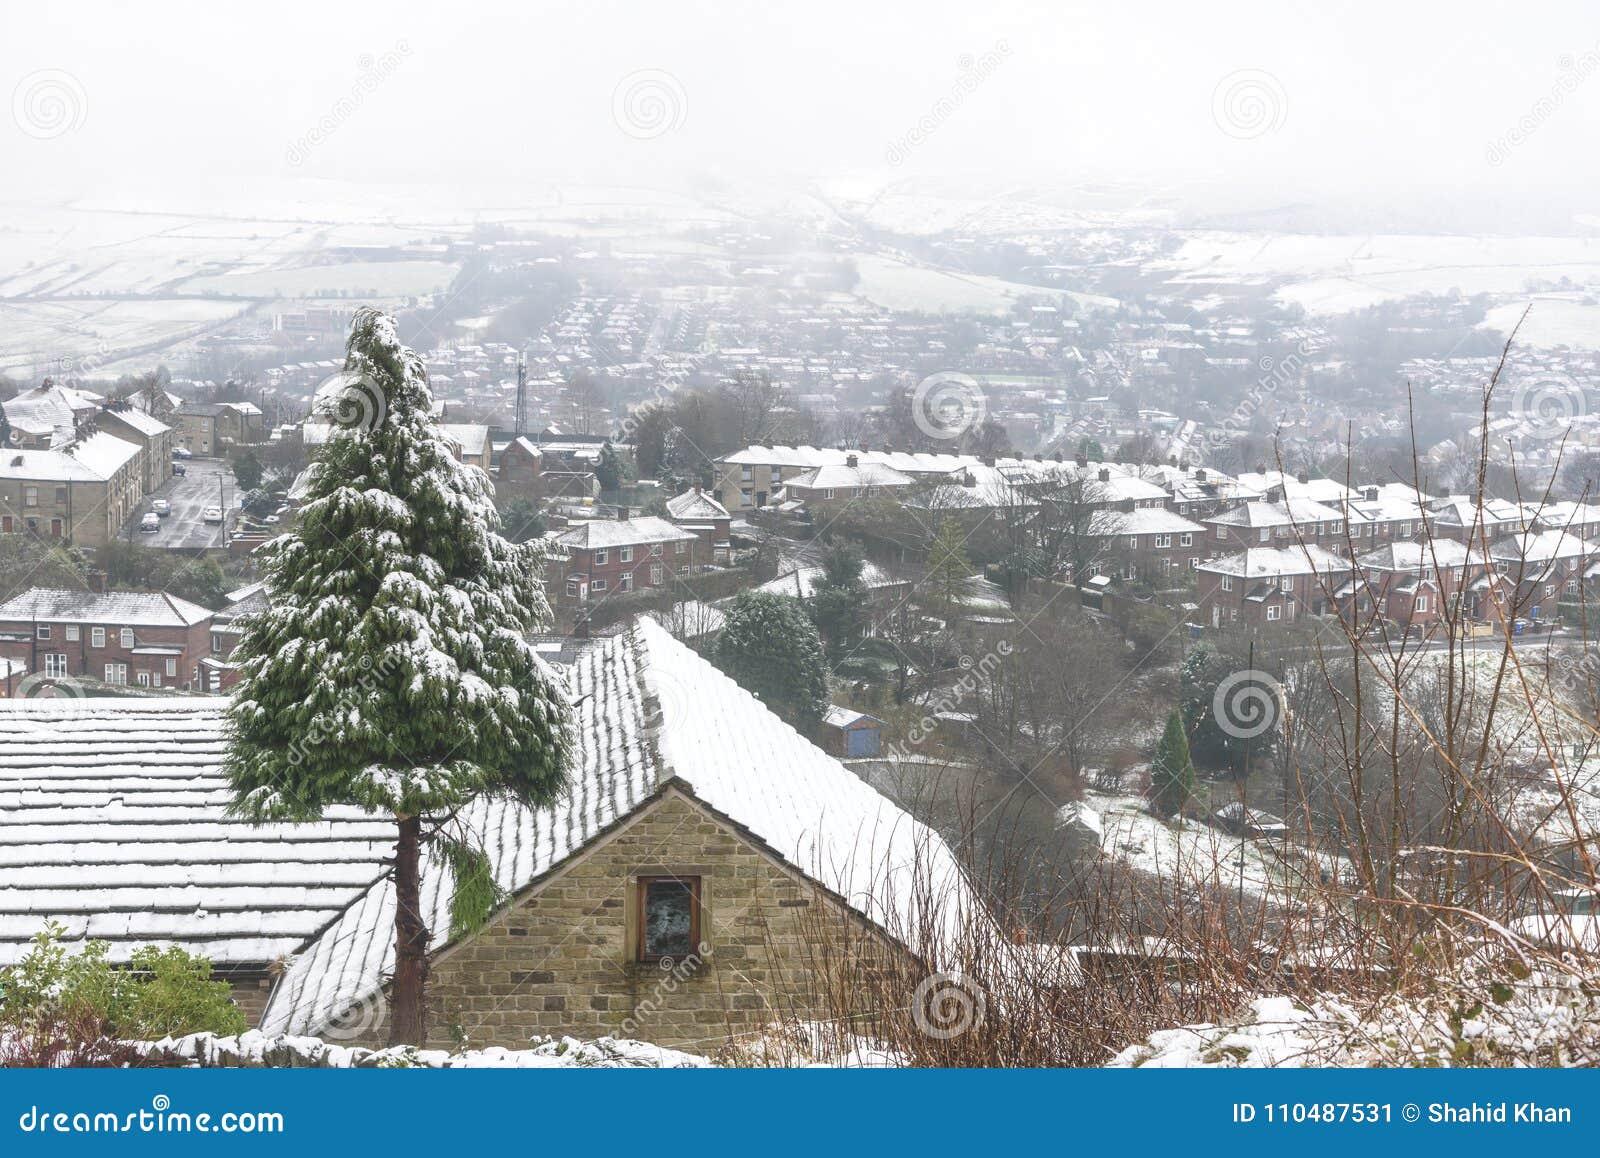 England Christmas Snow.Christmas Tree Snow Covered Village Uk Stock Image Image